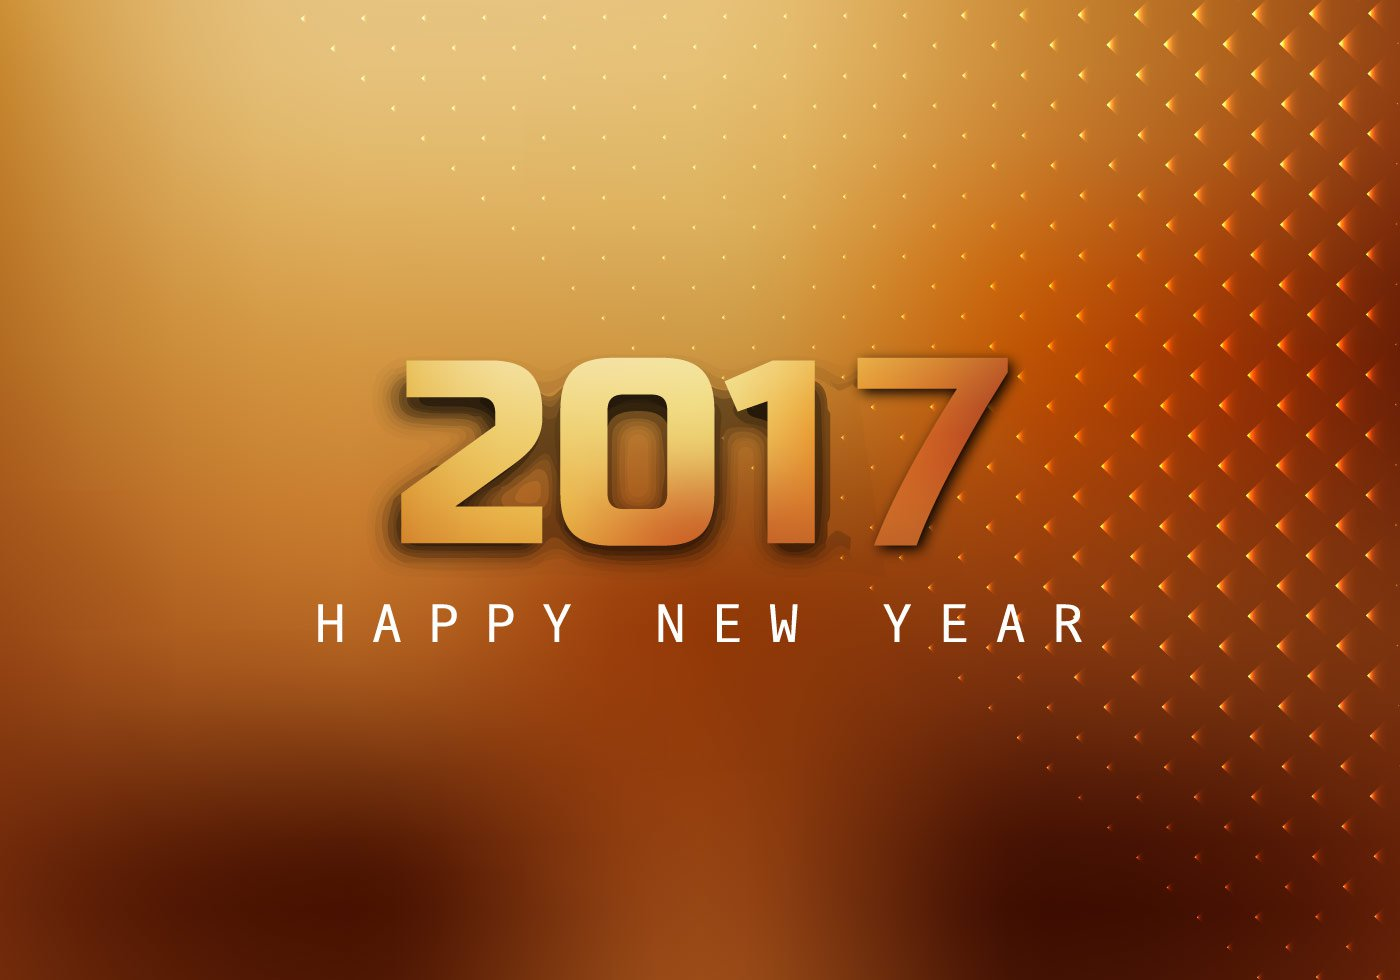 40 Beautiful Happy New Year 2017 Wallpaper Design Sparkle